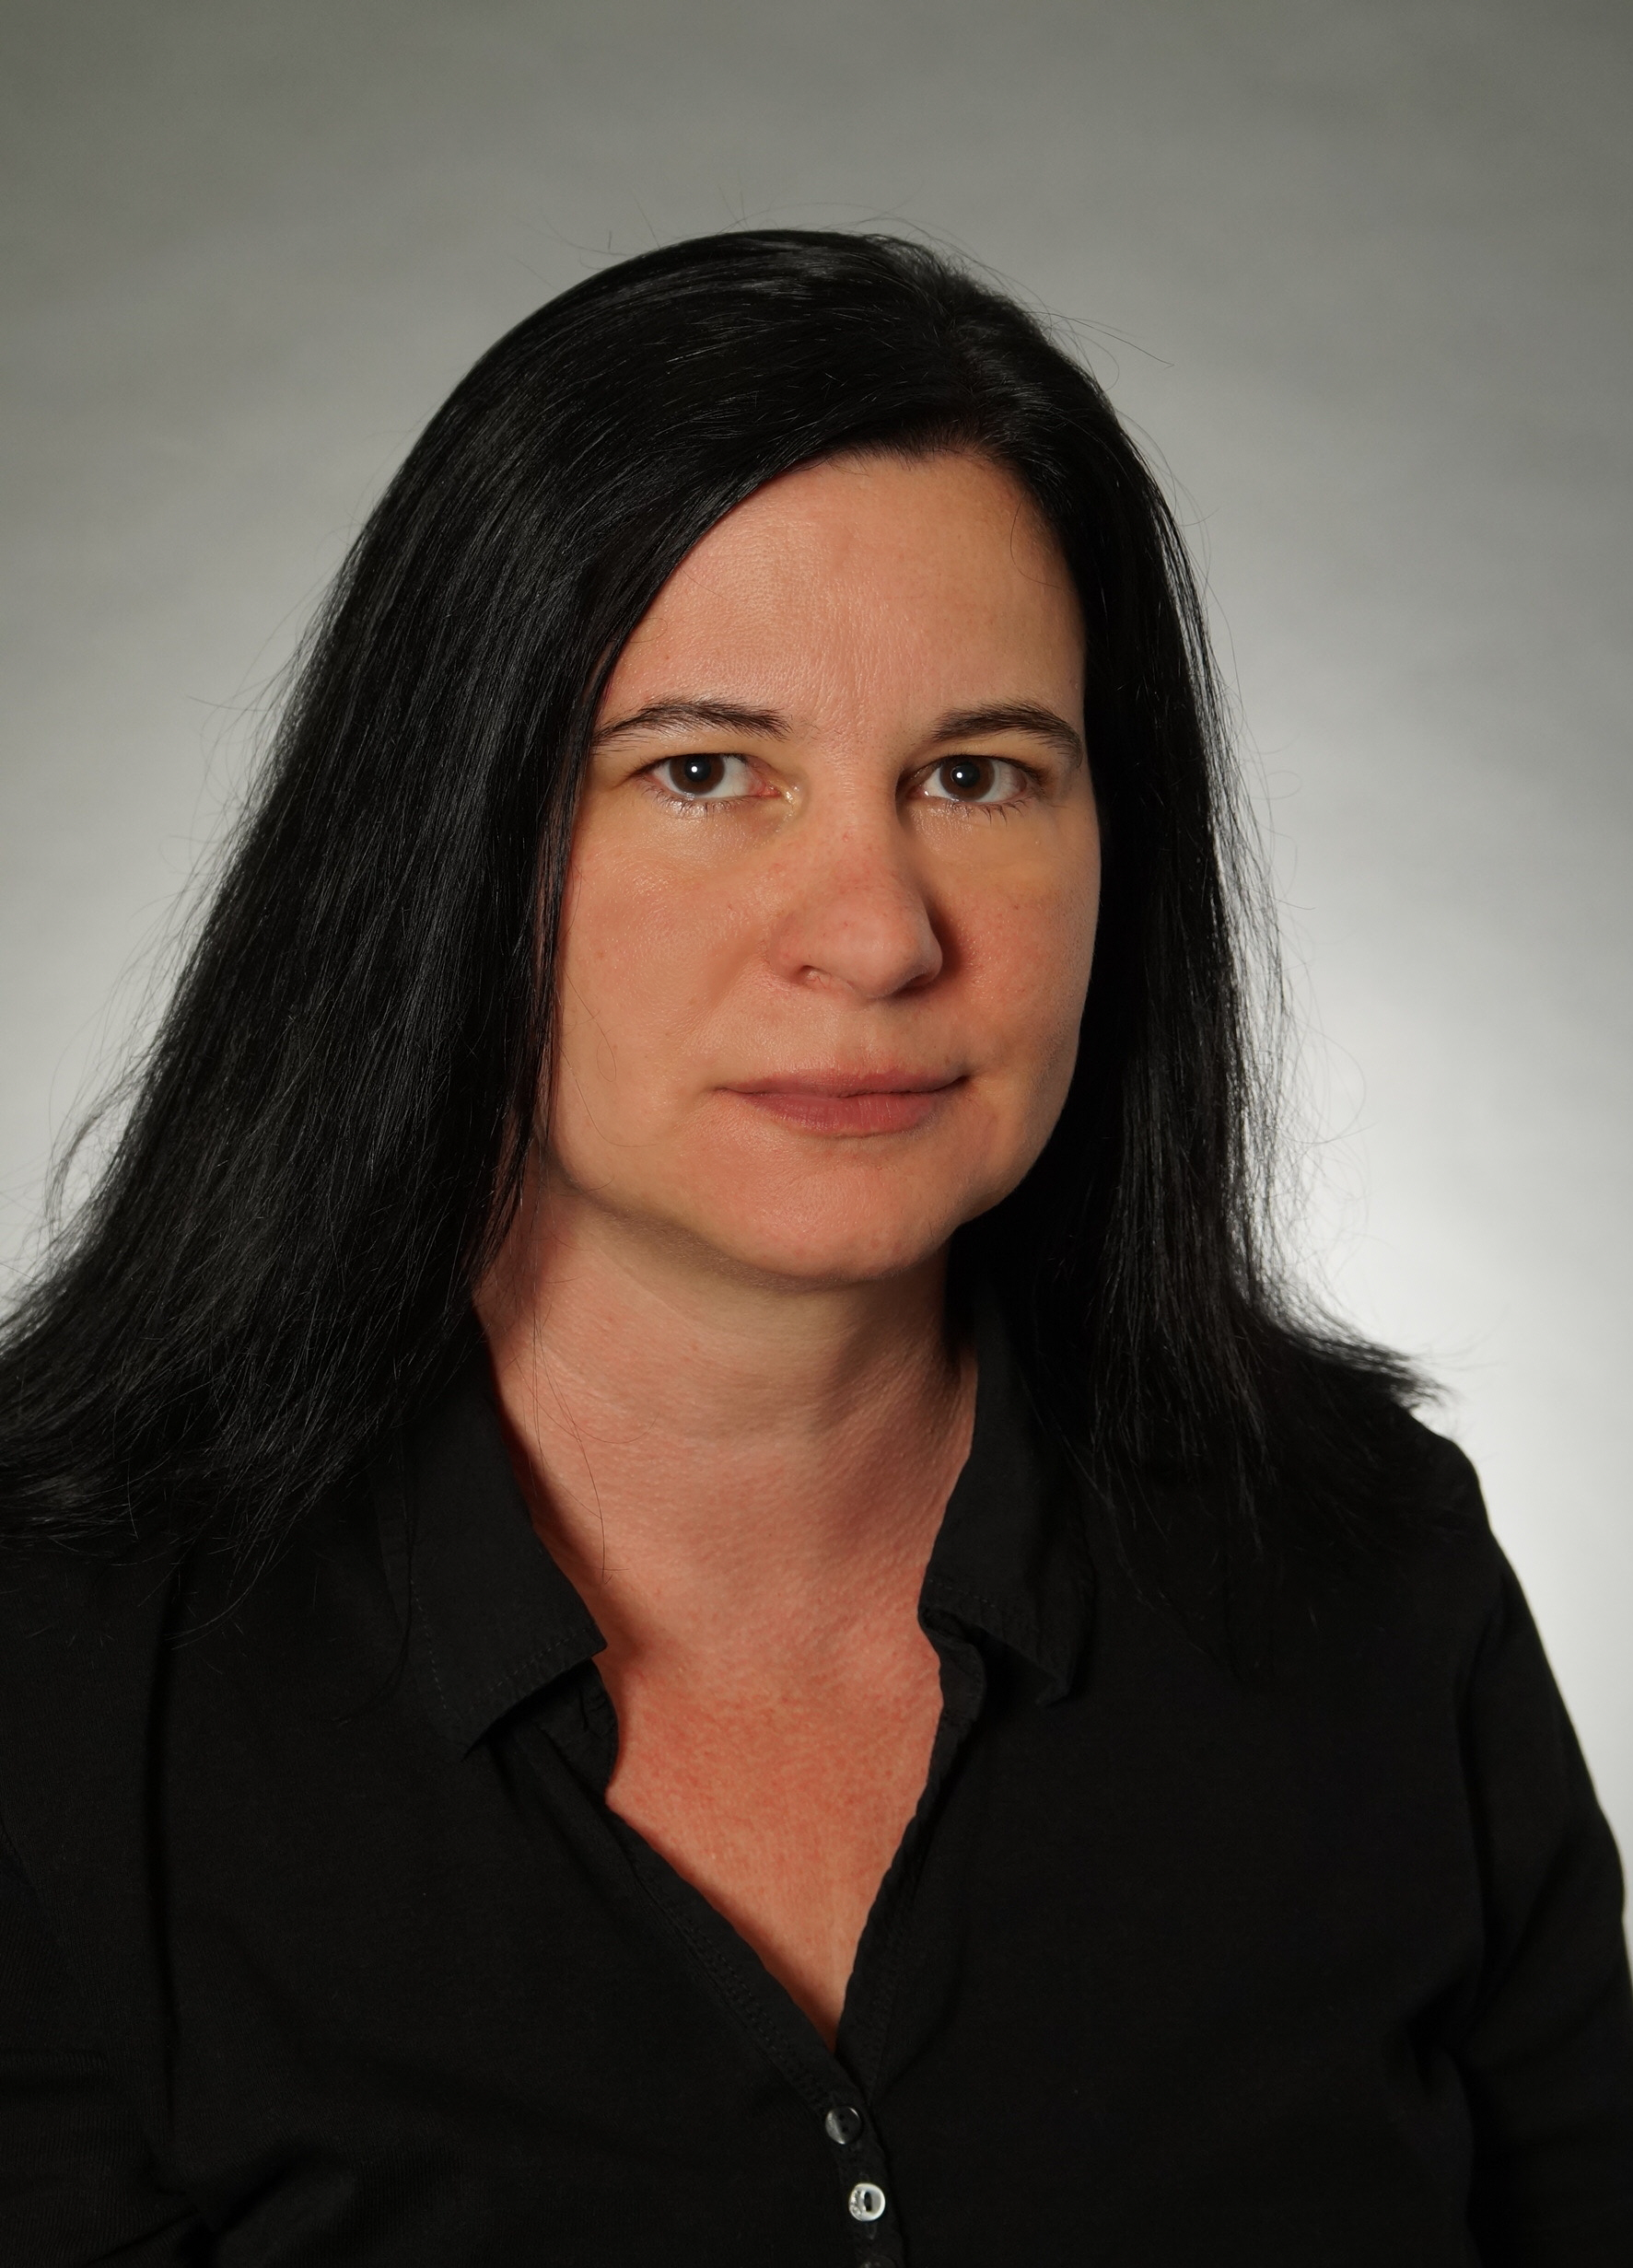 Prof. Dr. Christine Peinelt